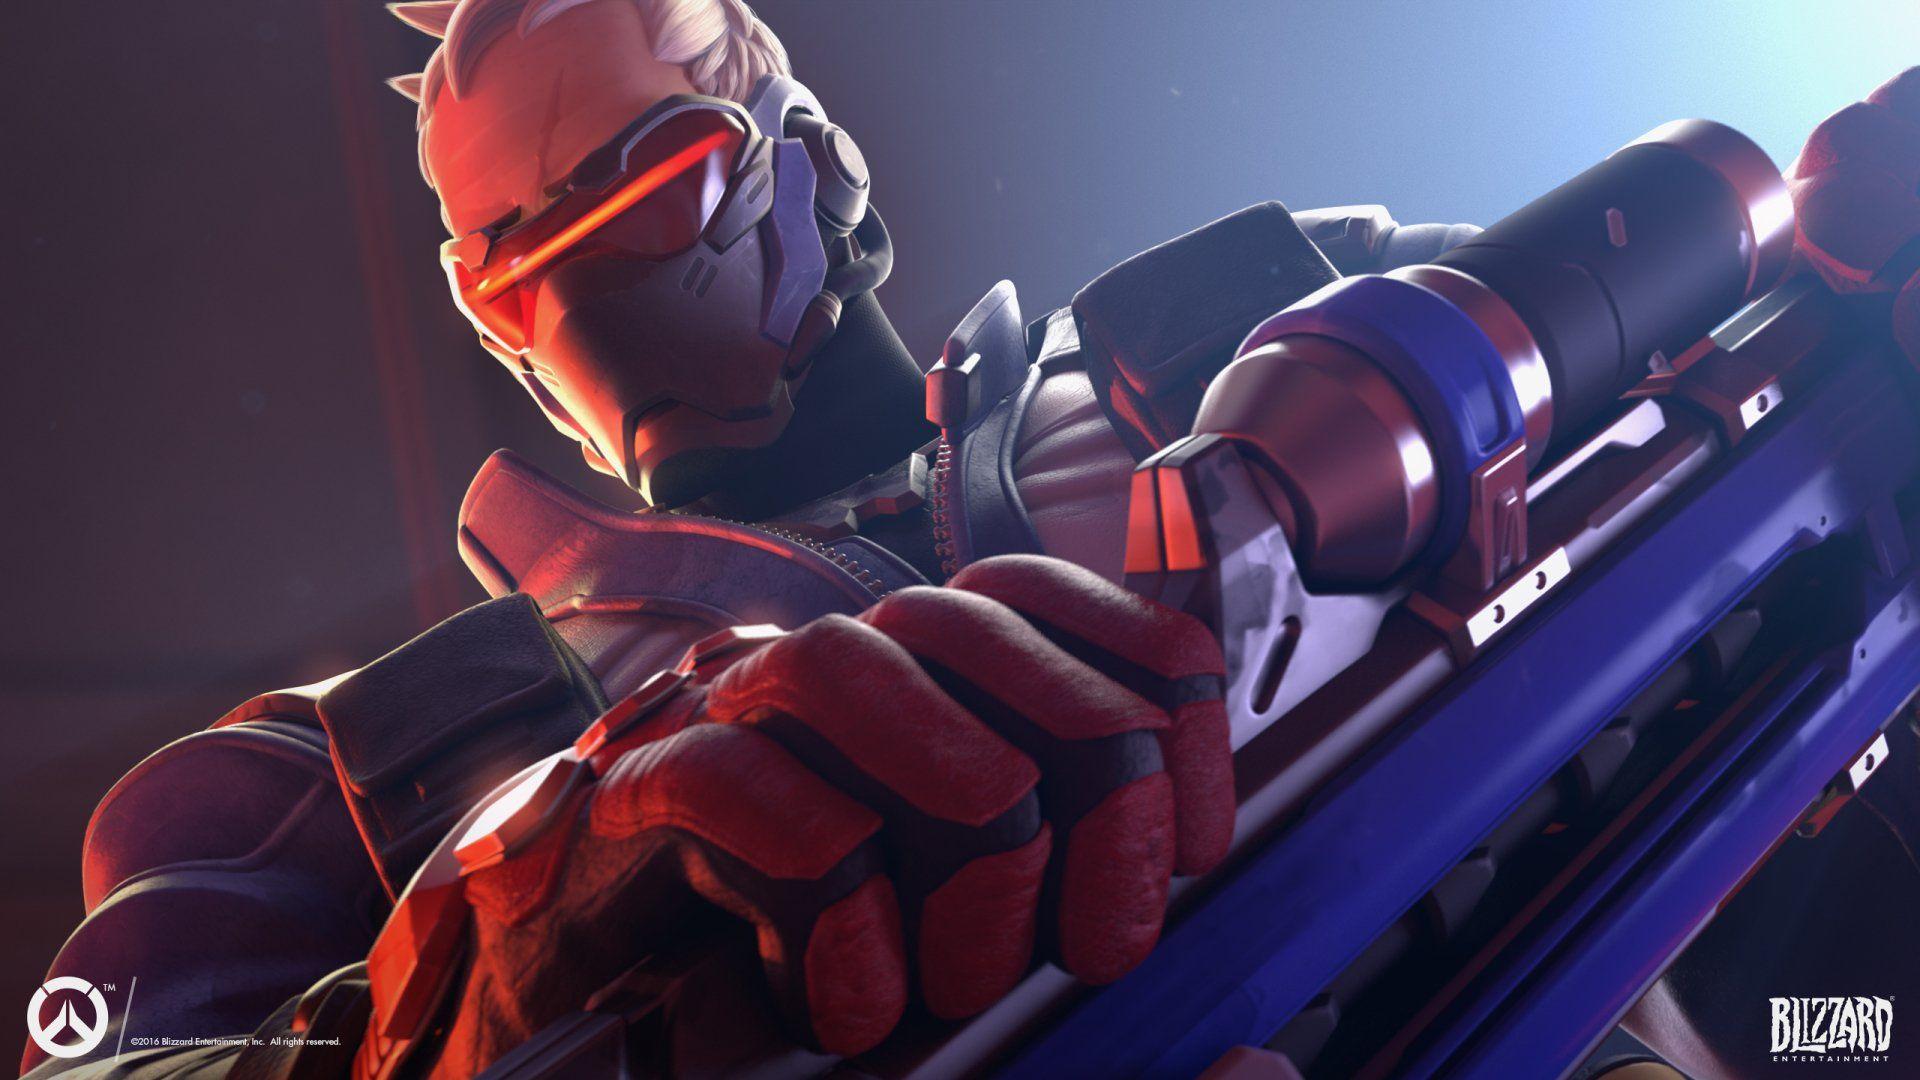 Video Game Overwatch Soldier 76 Overwatch Wallpaper Soldier 76 Overwatch Soldier